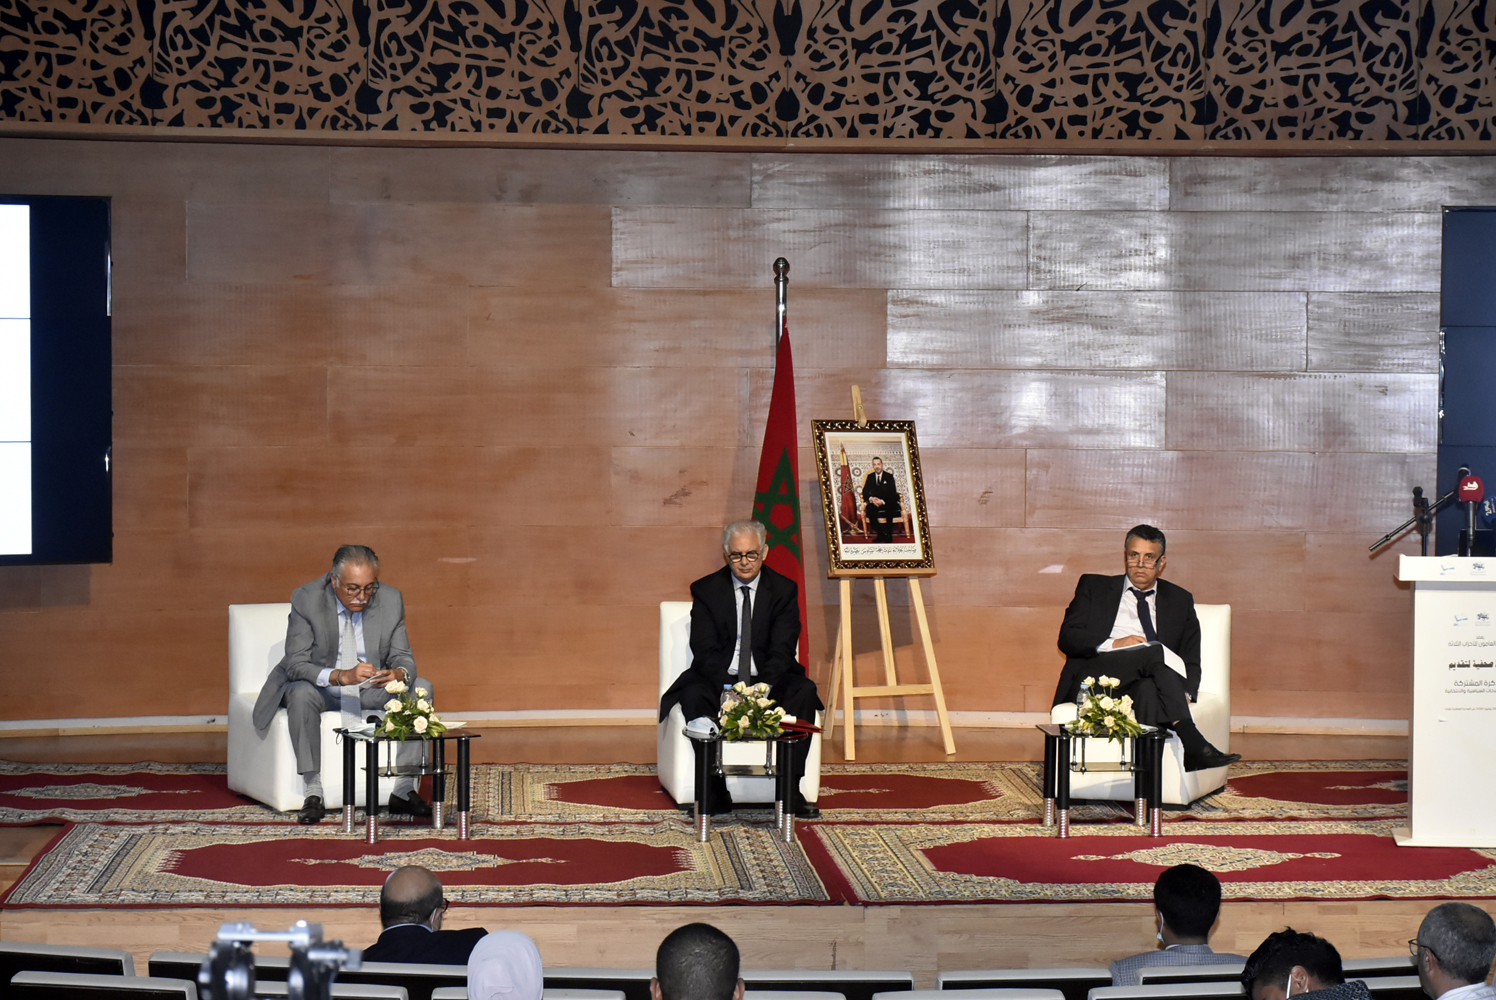 Istiqlal, PAM, PPS : Concertation, coordination et coalition si affinités